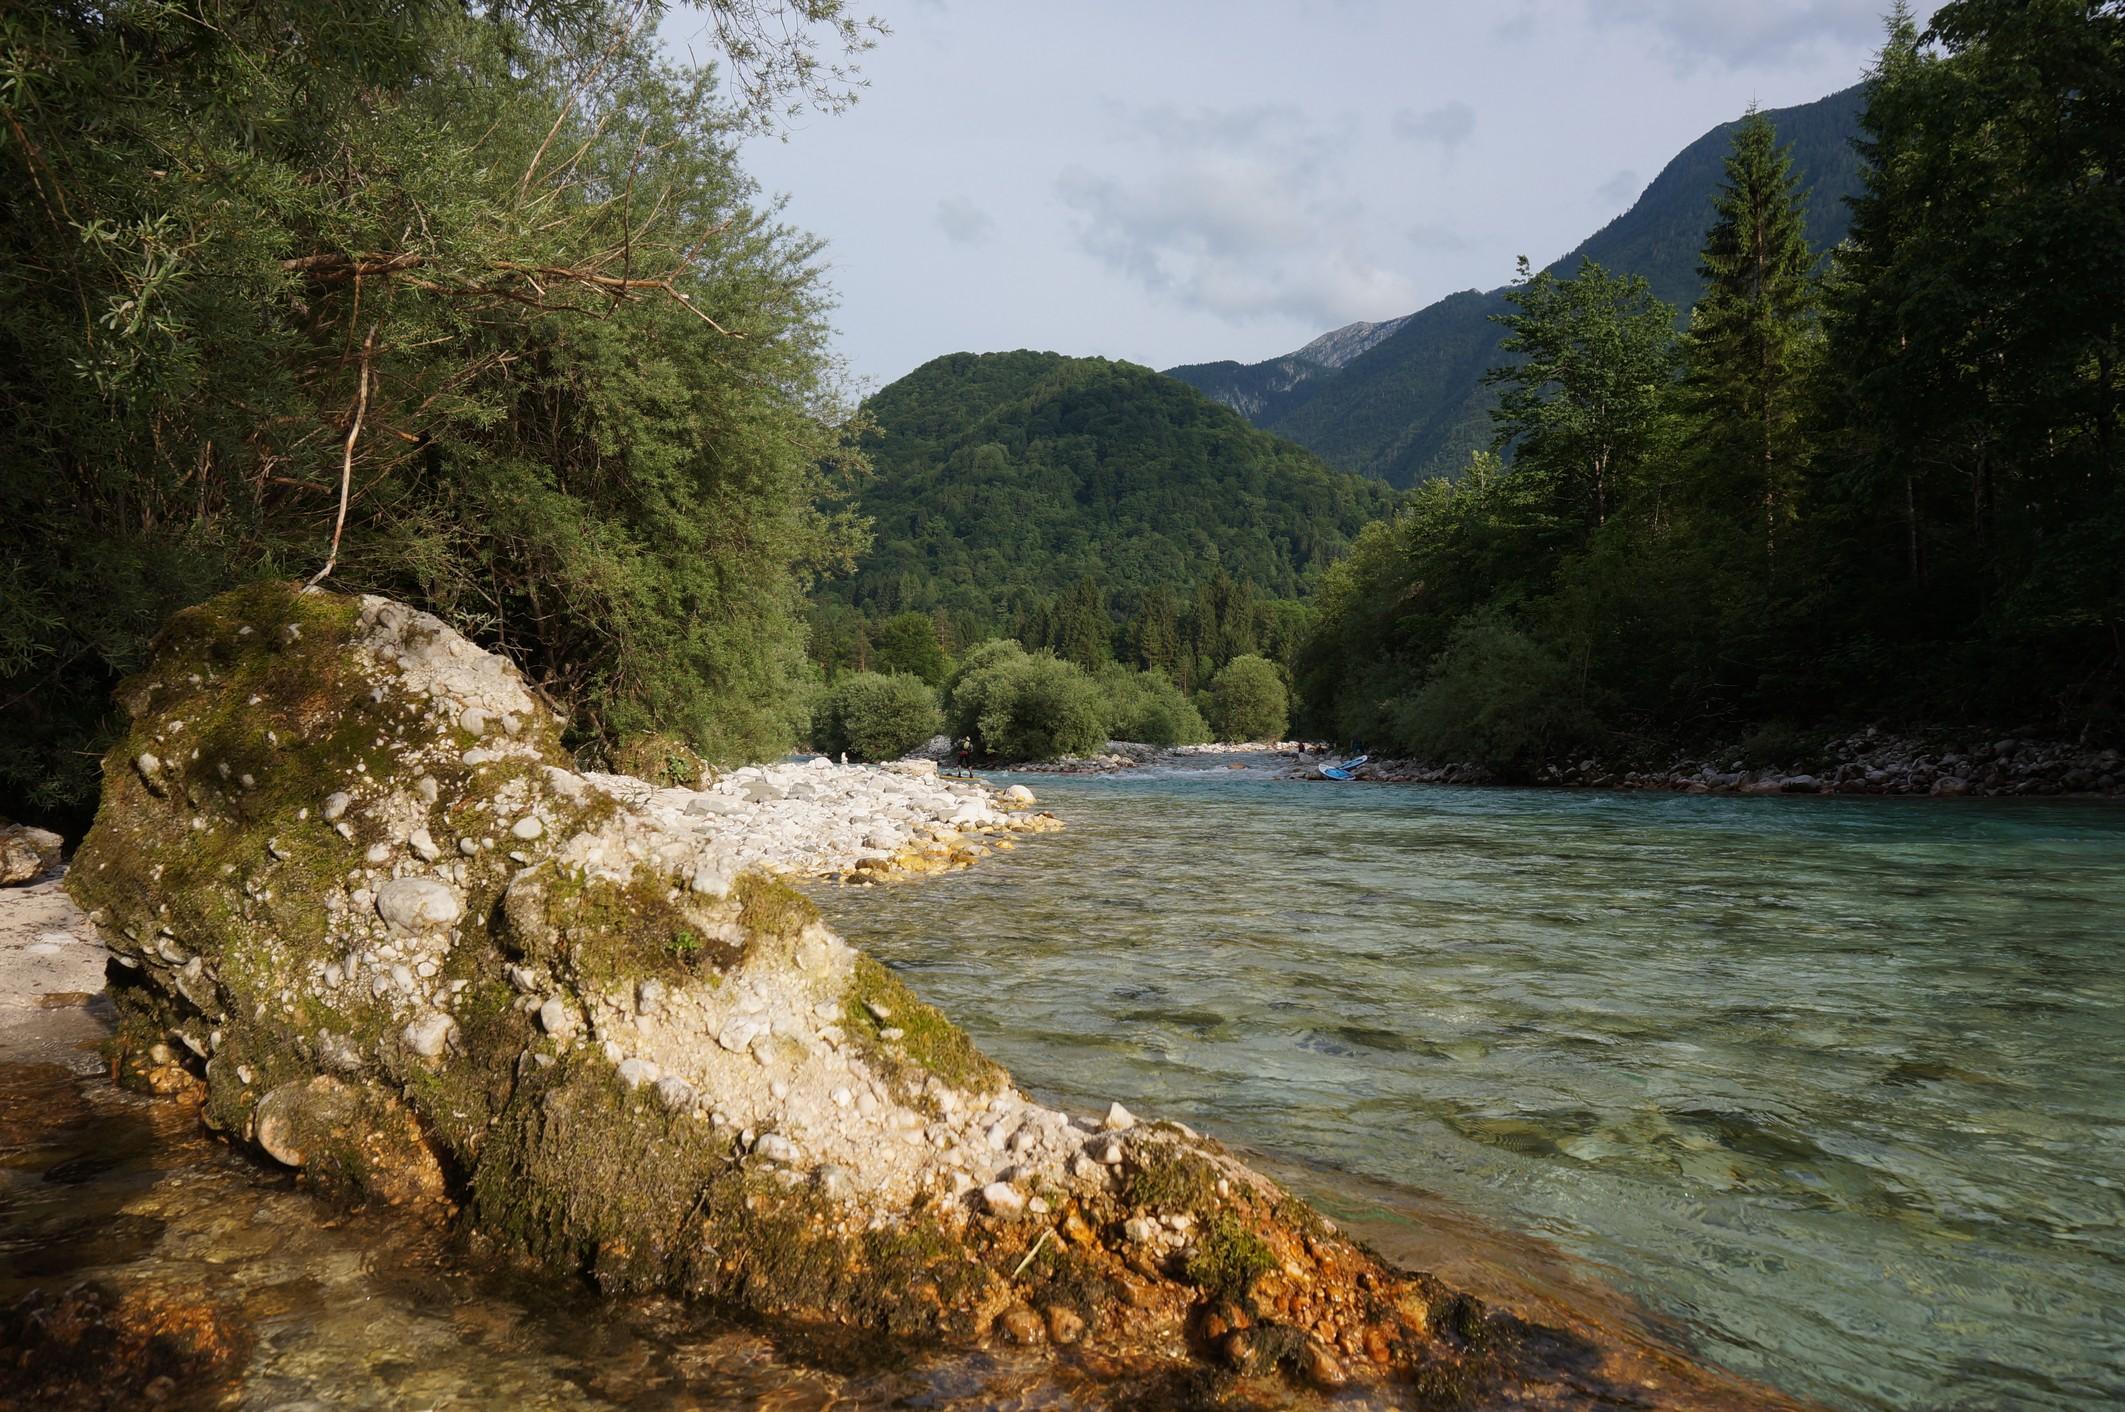 Slovinsko: Řeka Soča